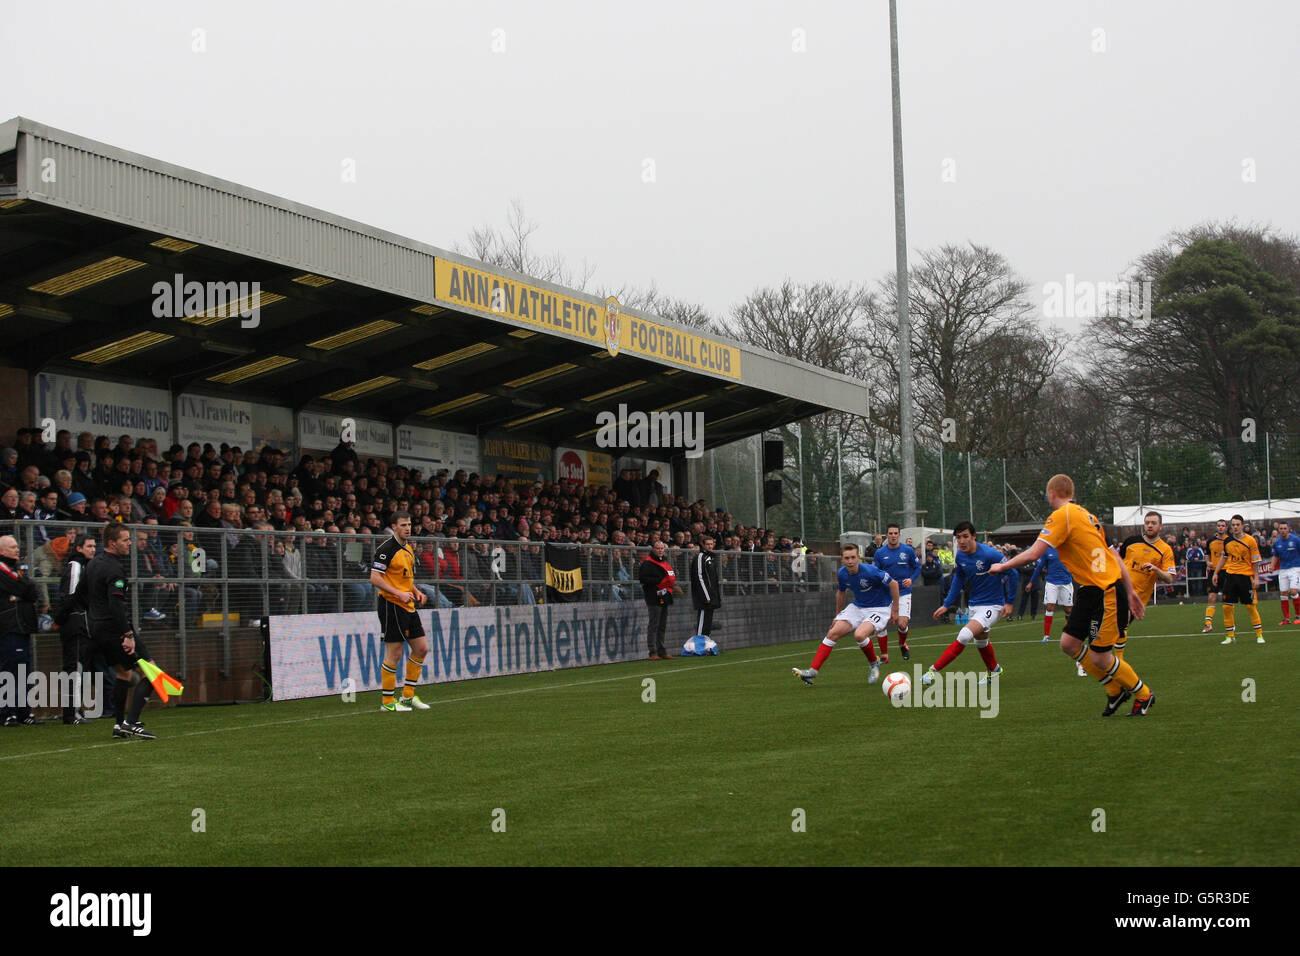 soccer-irn-bru-scottish-third-division-annan-athletic-v-rangers-galabank-G5R3DE.jpg